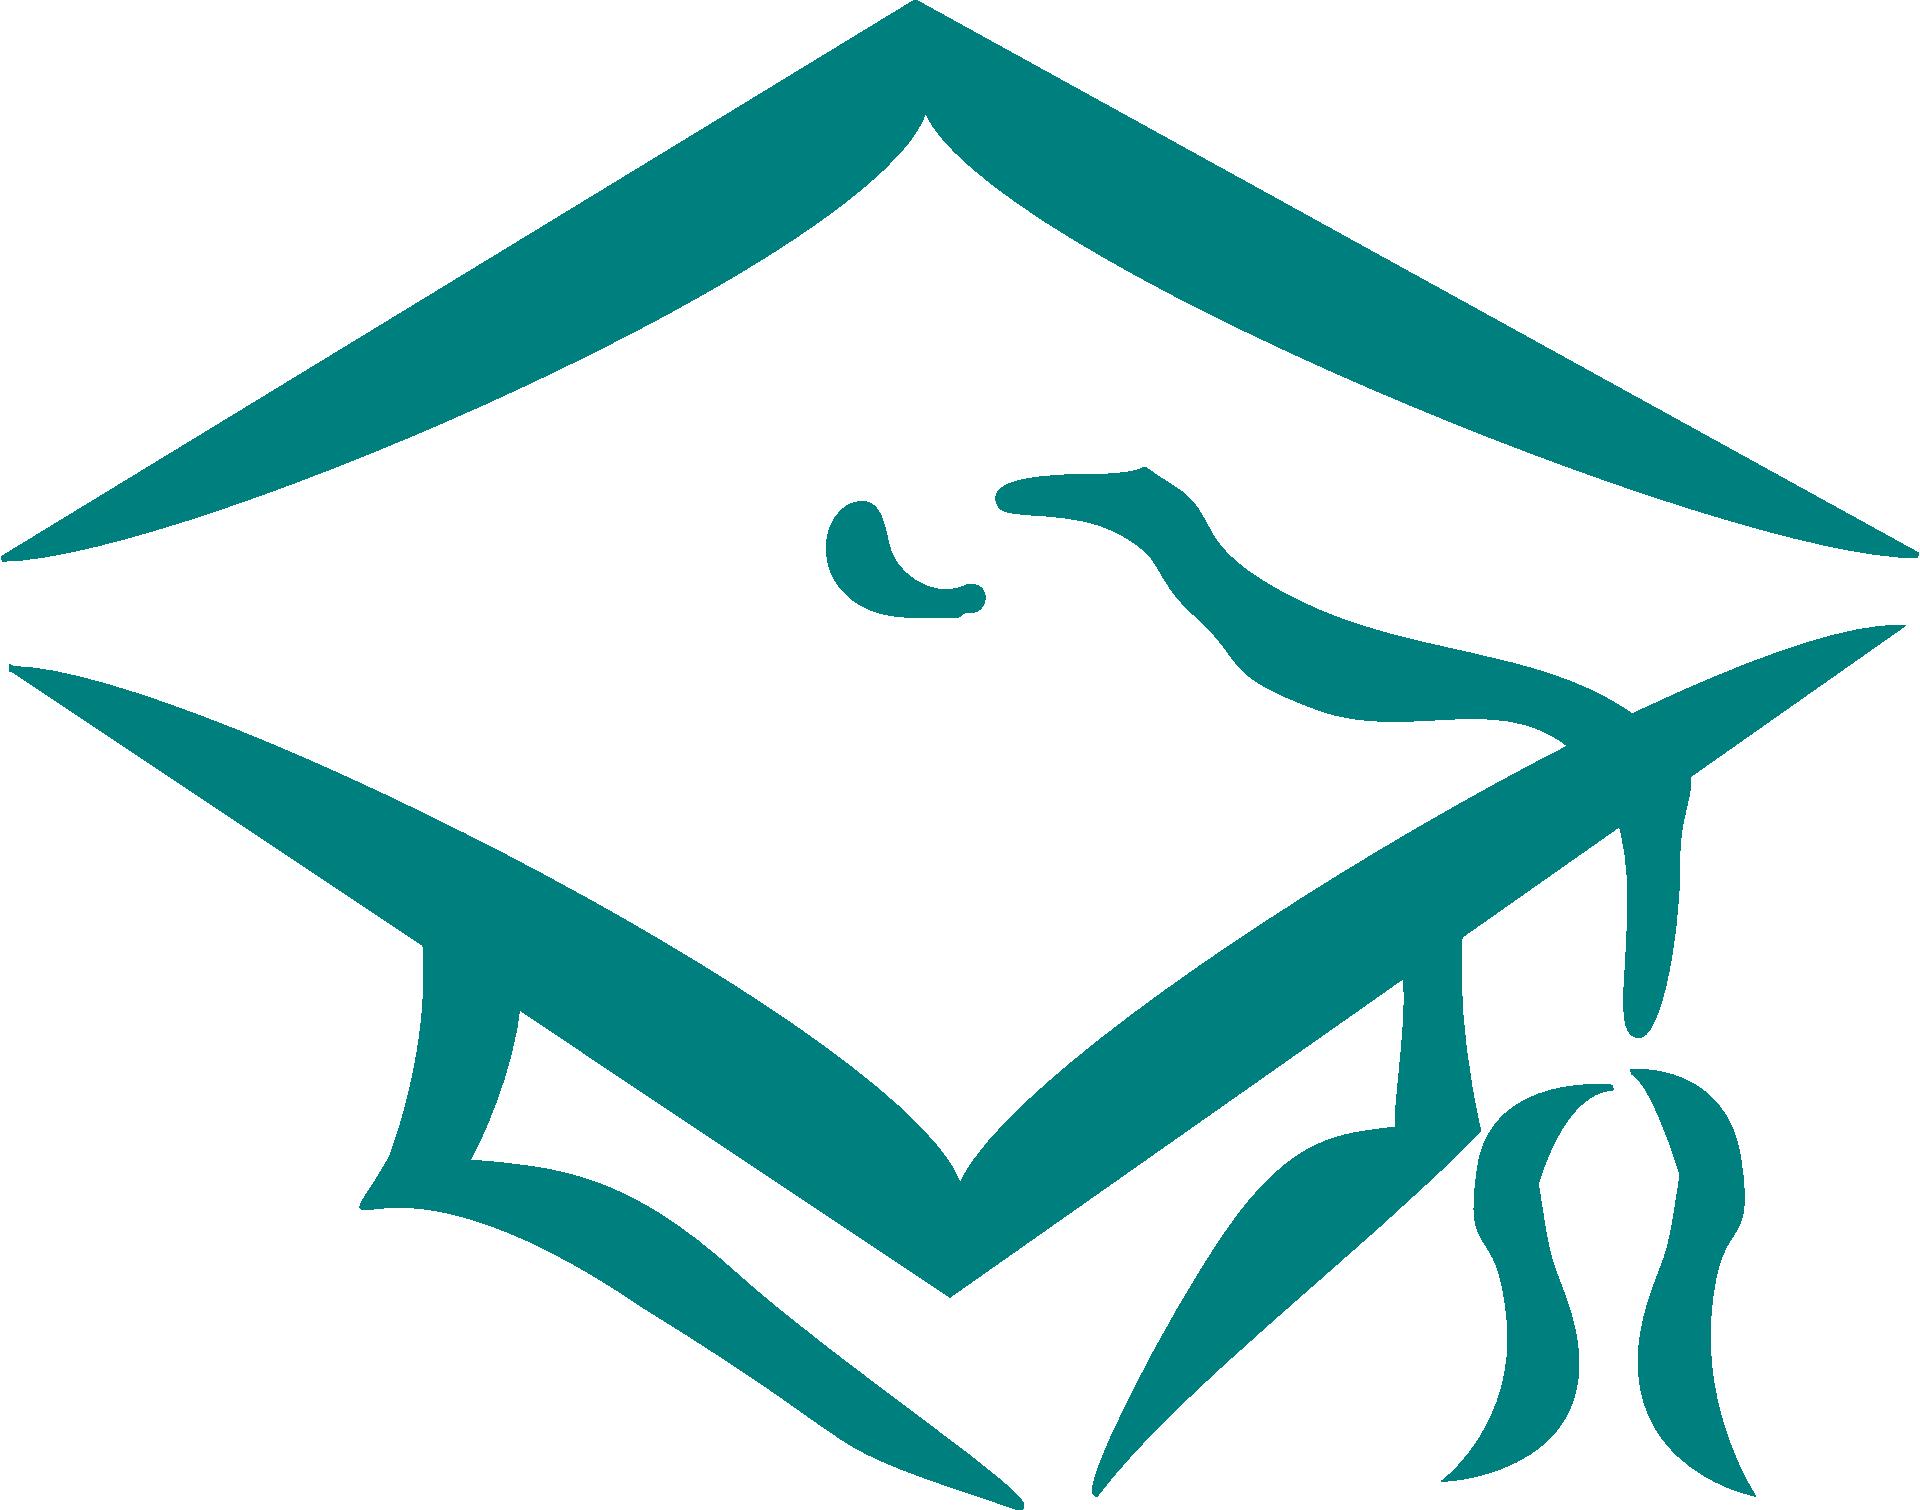 Drawing graduation cap free image